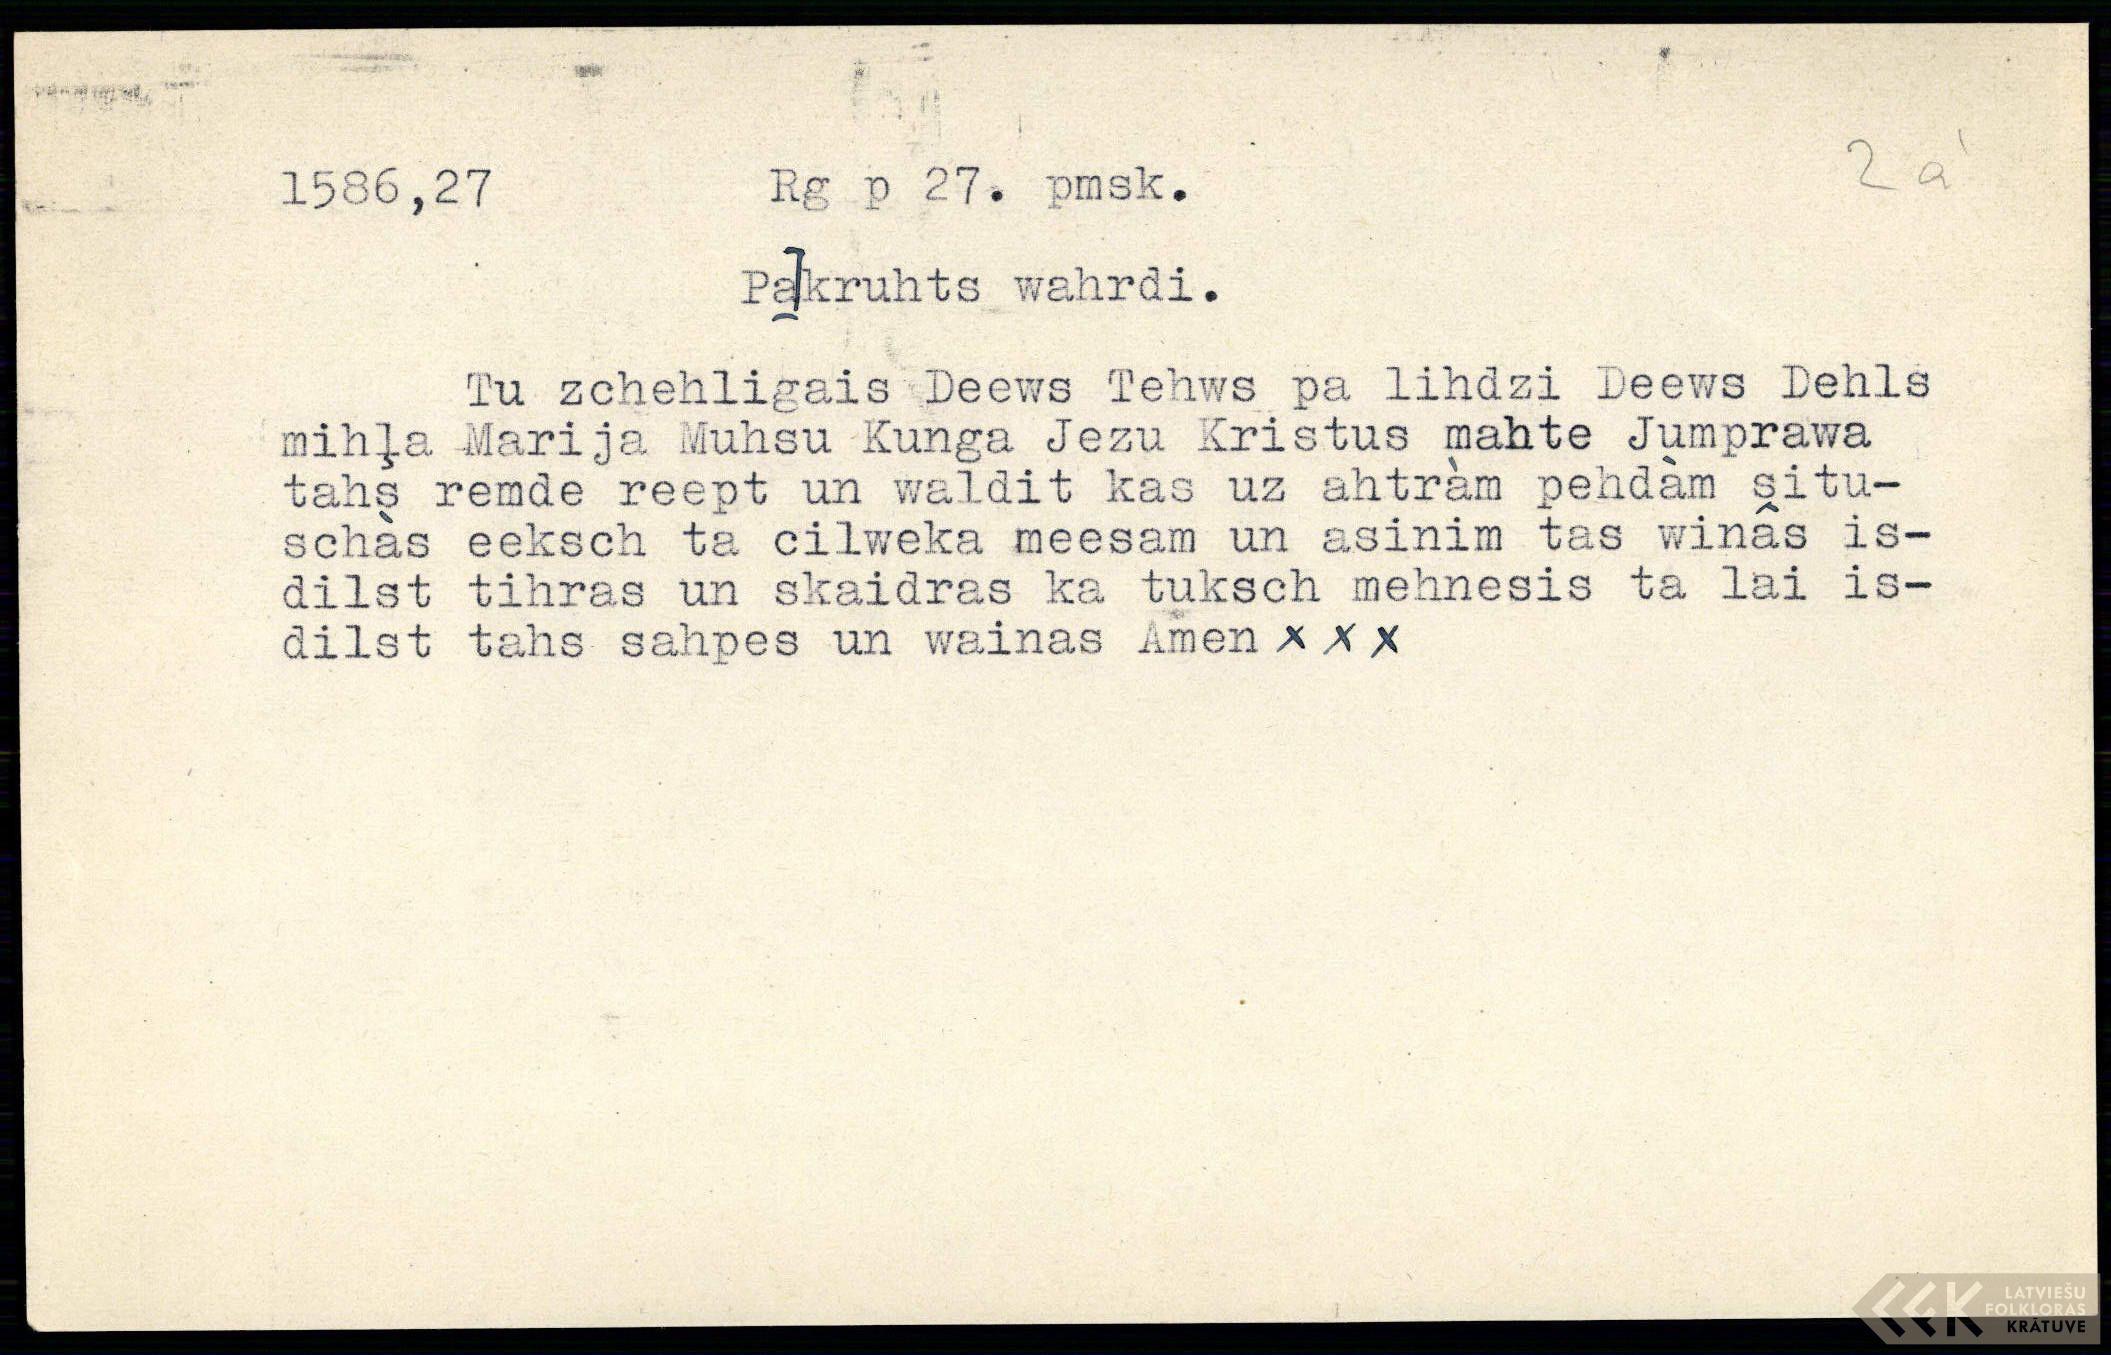 LFK-1586-00027-buramvardu-kartoteka